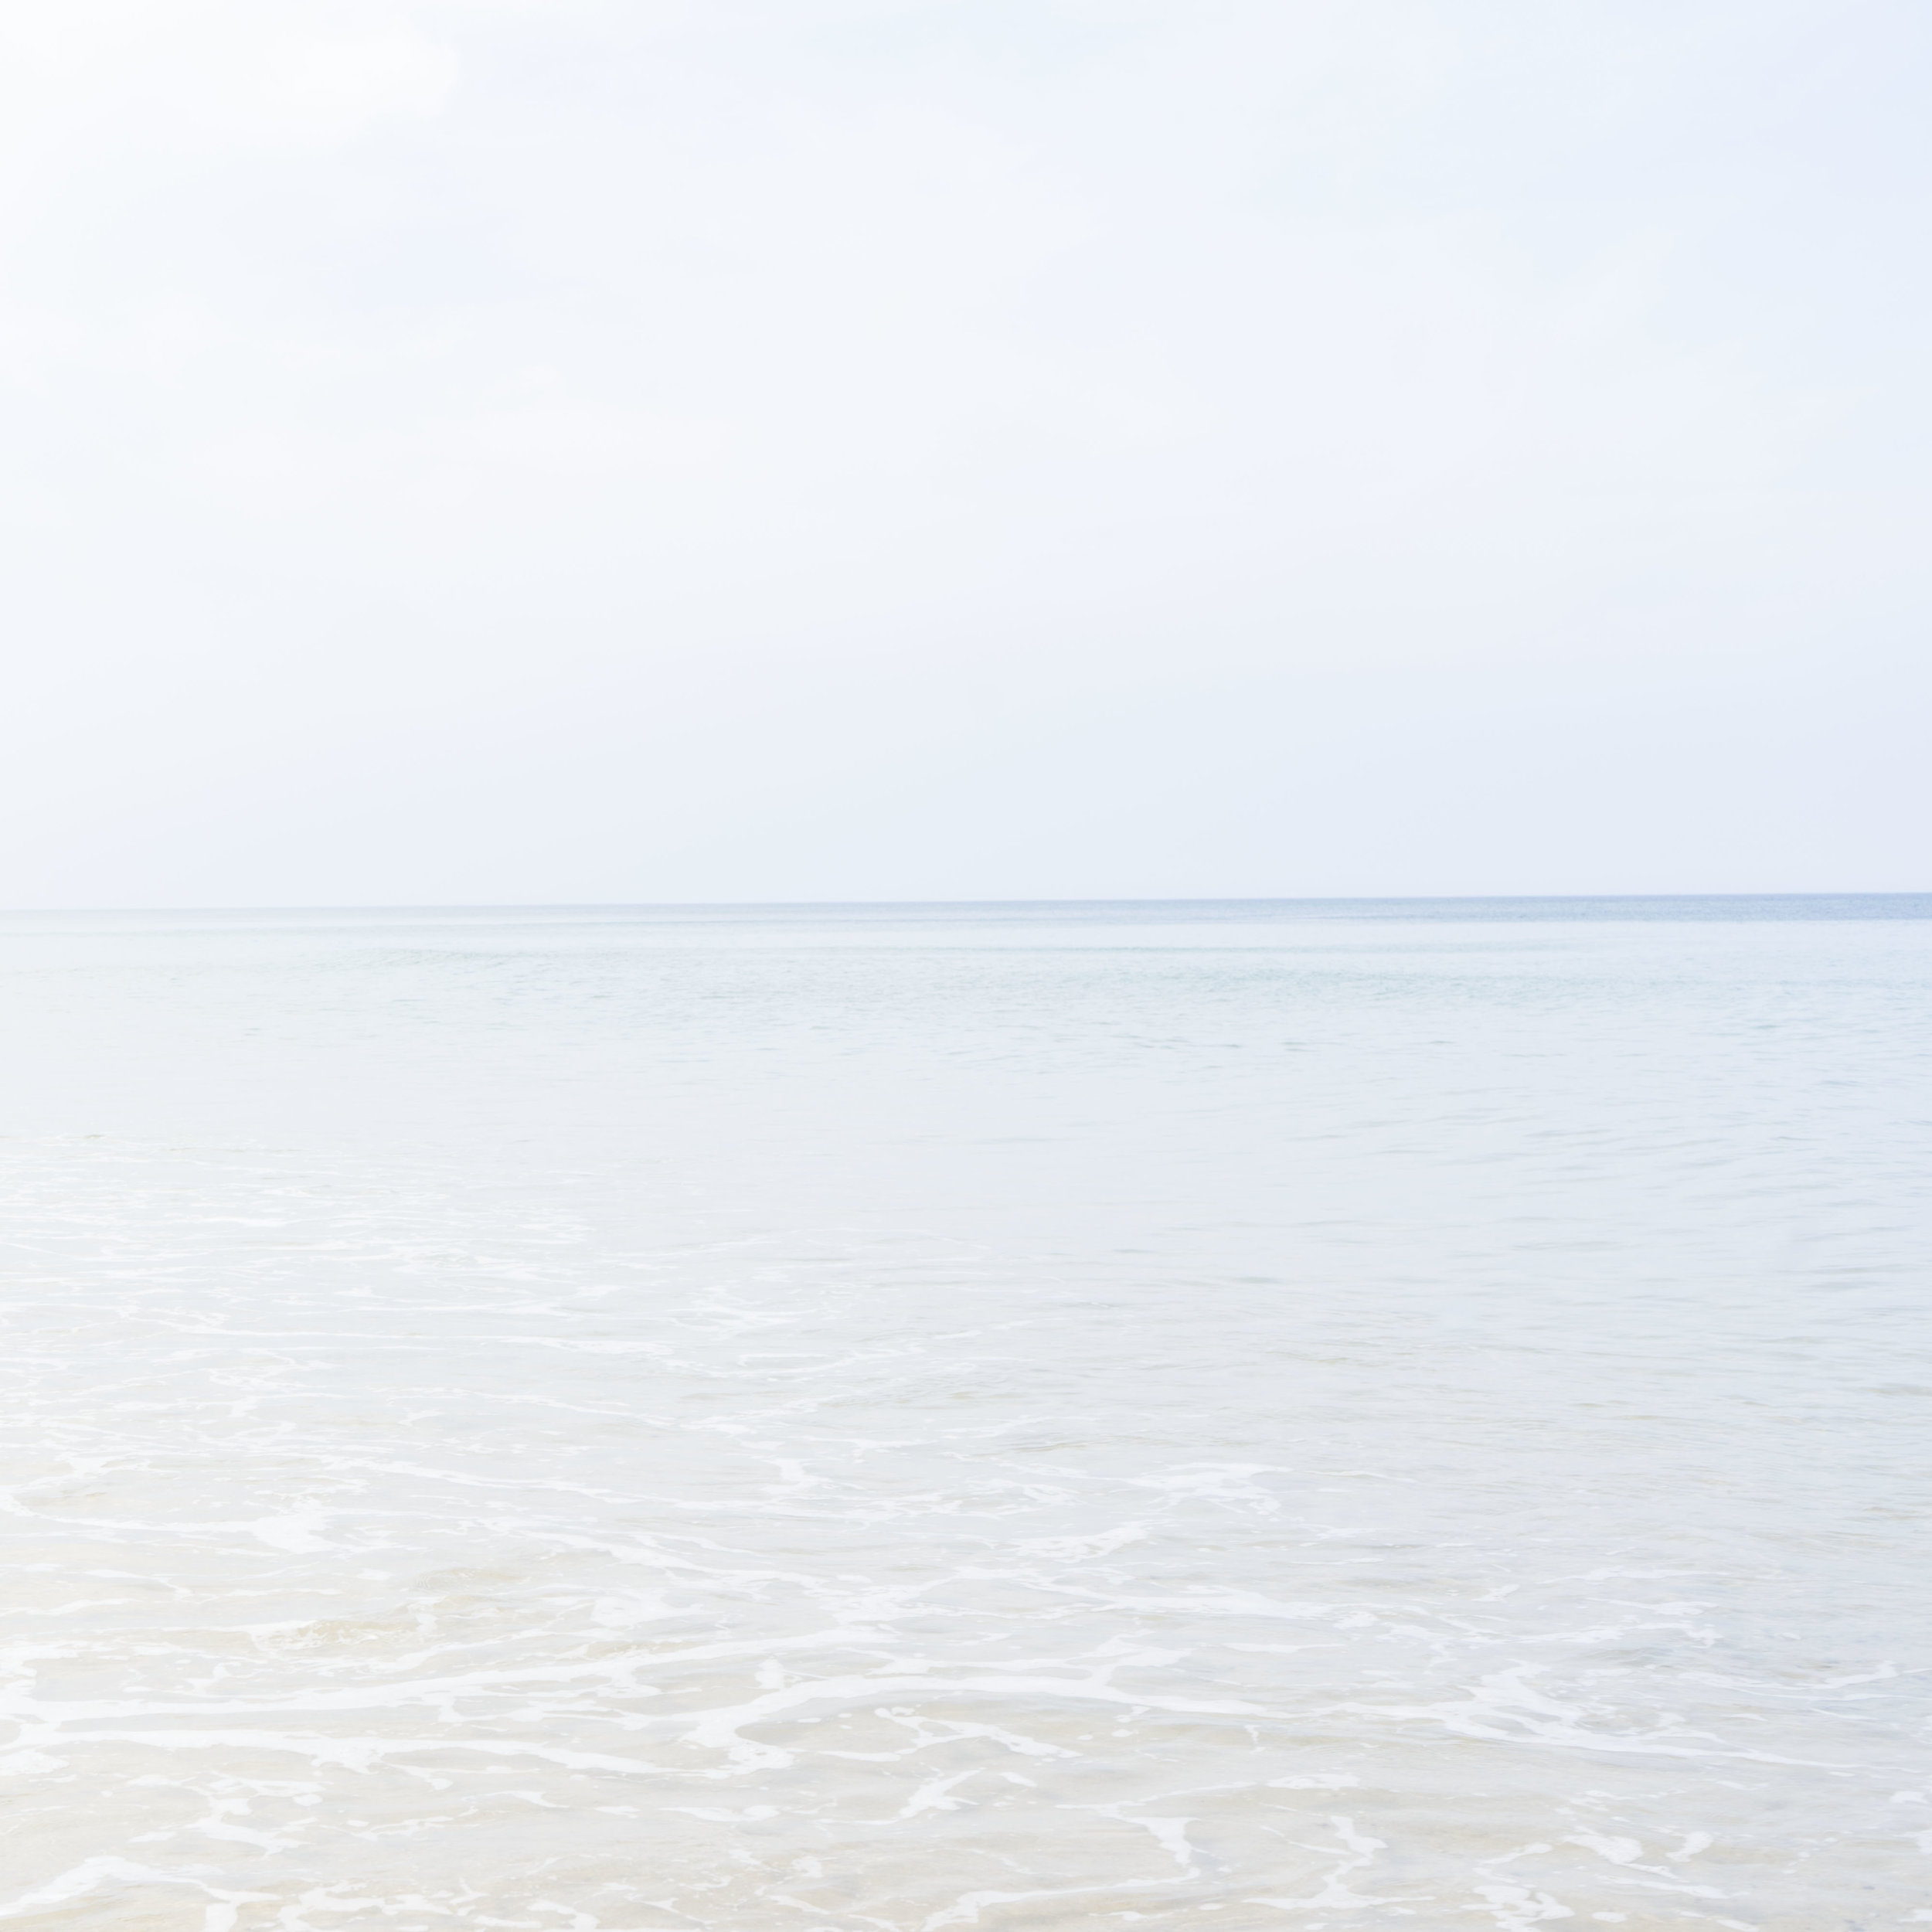 Seascape2018_6.jpg